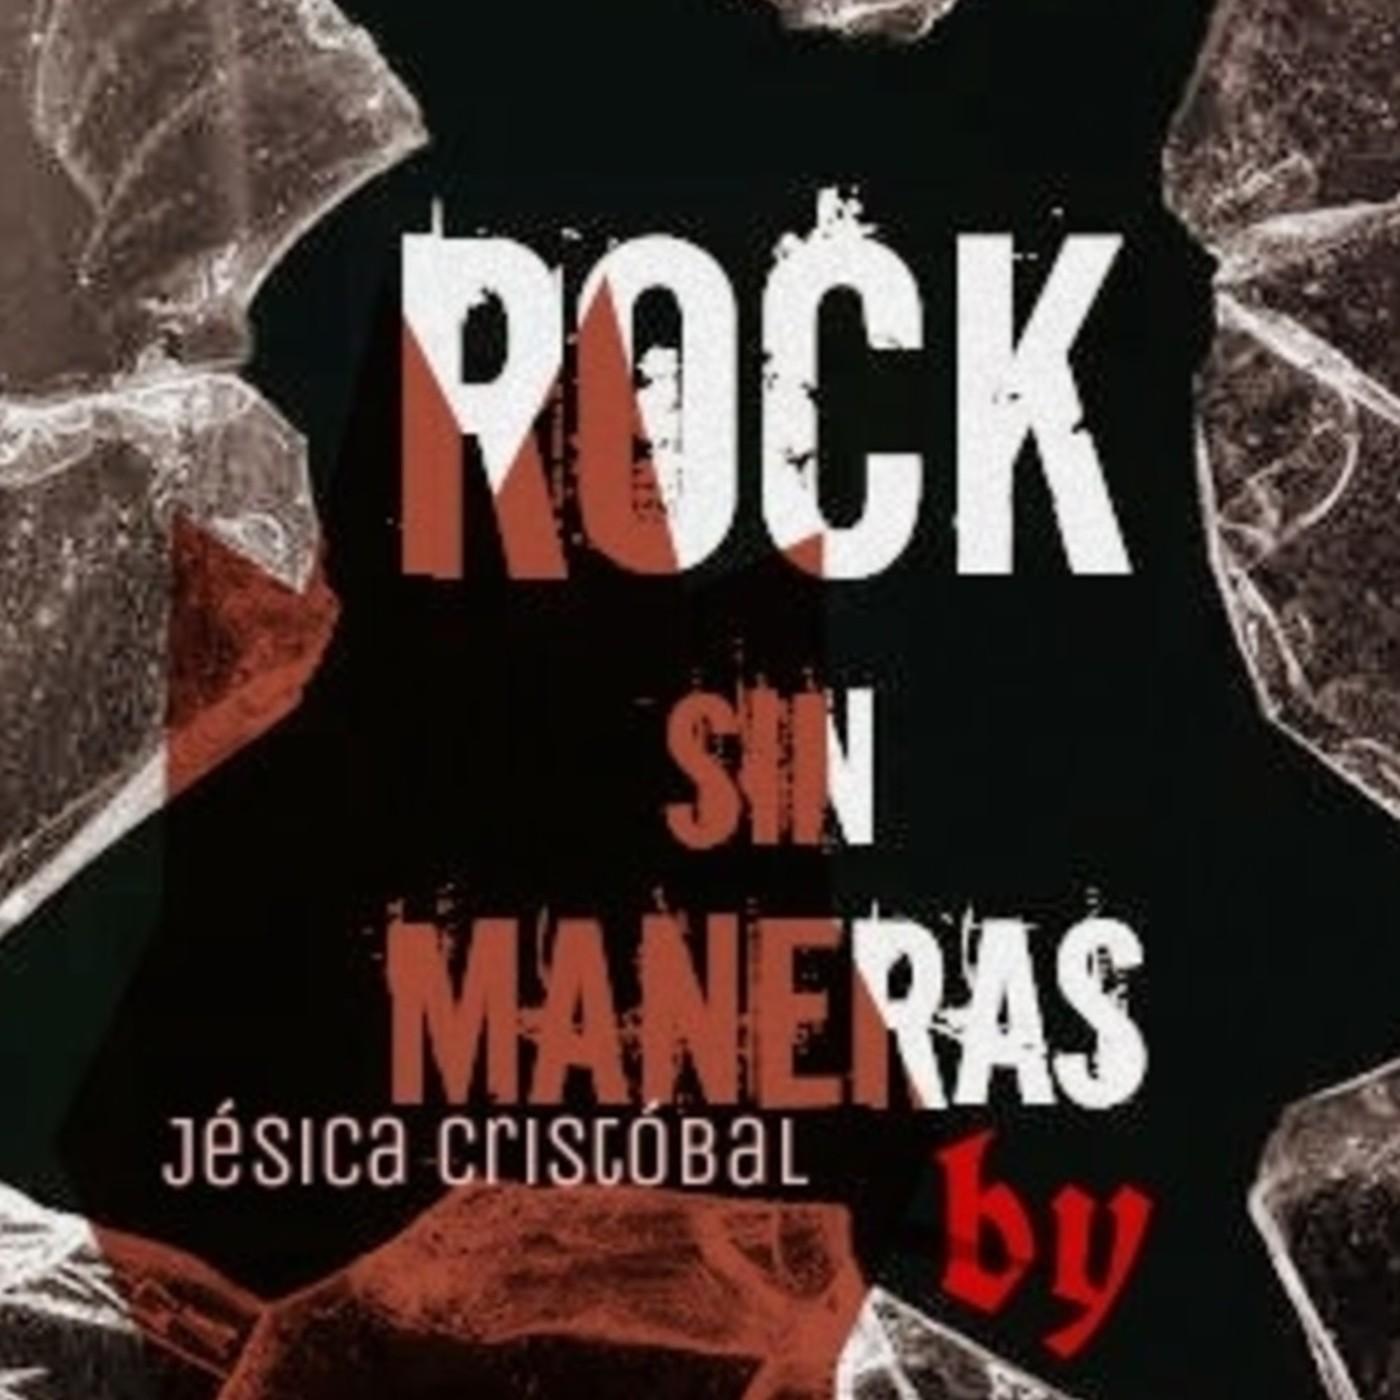 RocksinManeras 05x04: rock para tod@s